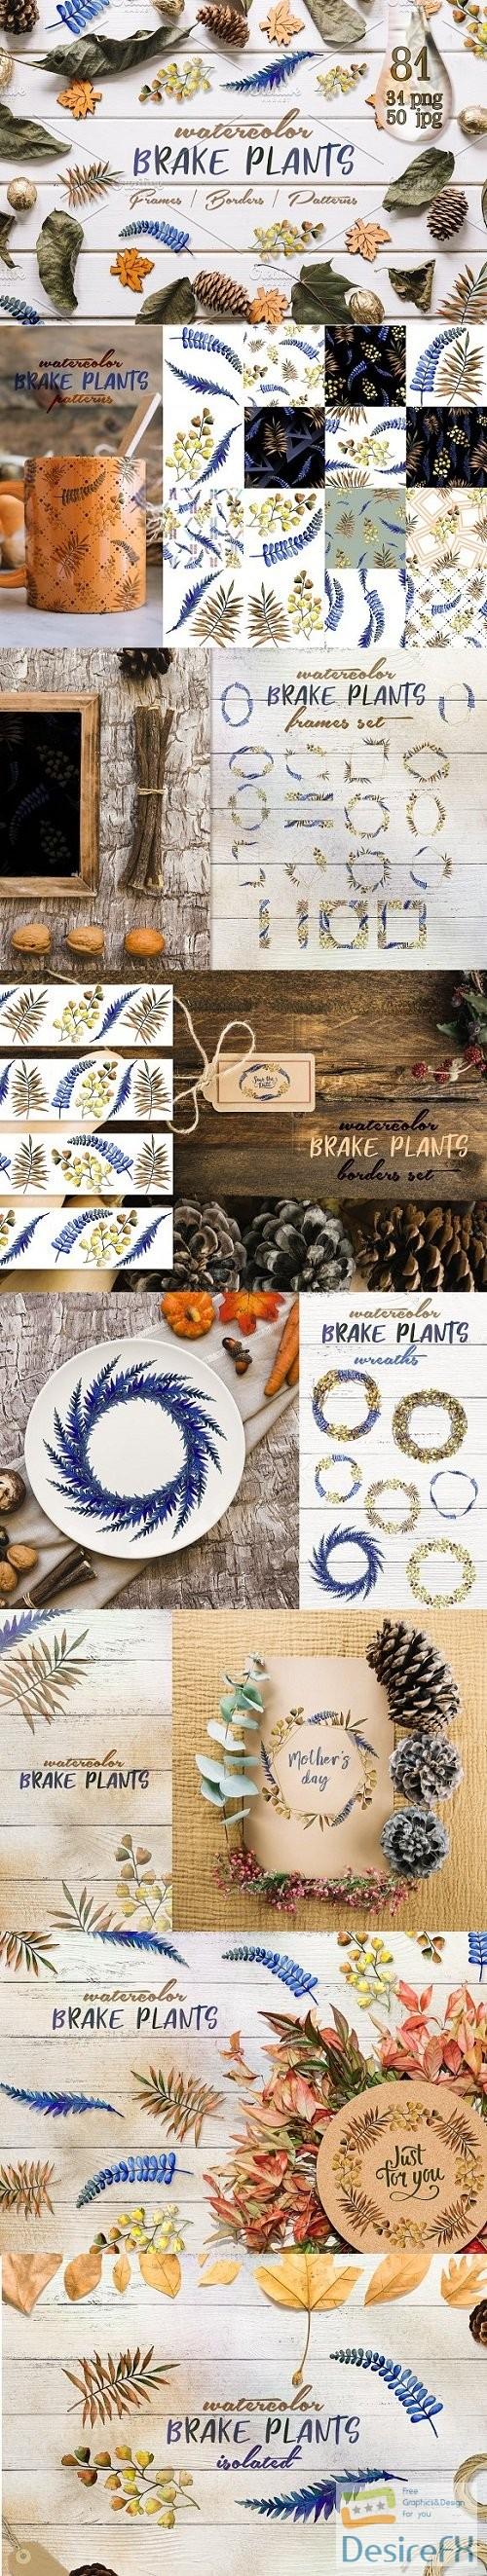 stock-images - Brake plants PNG watercolor set - 3060007